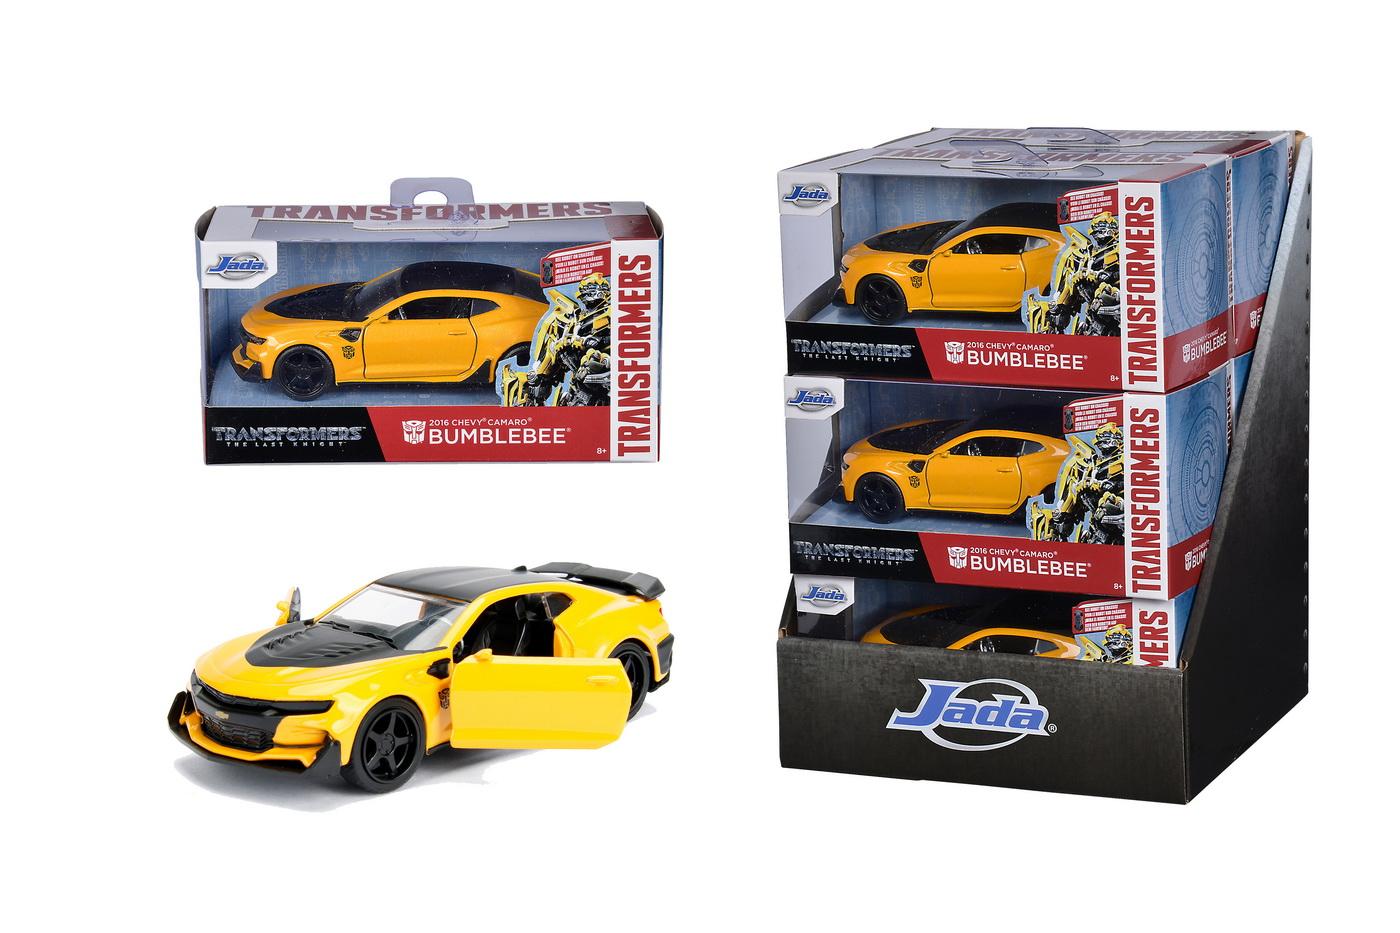 Masinuta Metalica Transformers 2016 Chevy Camaro Scara 1 La 32   JadaToys - 8